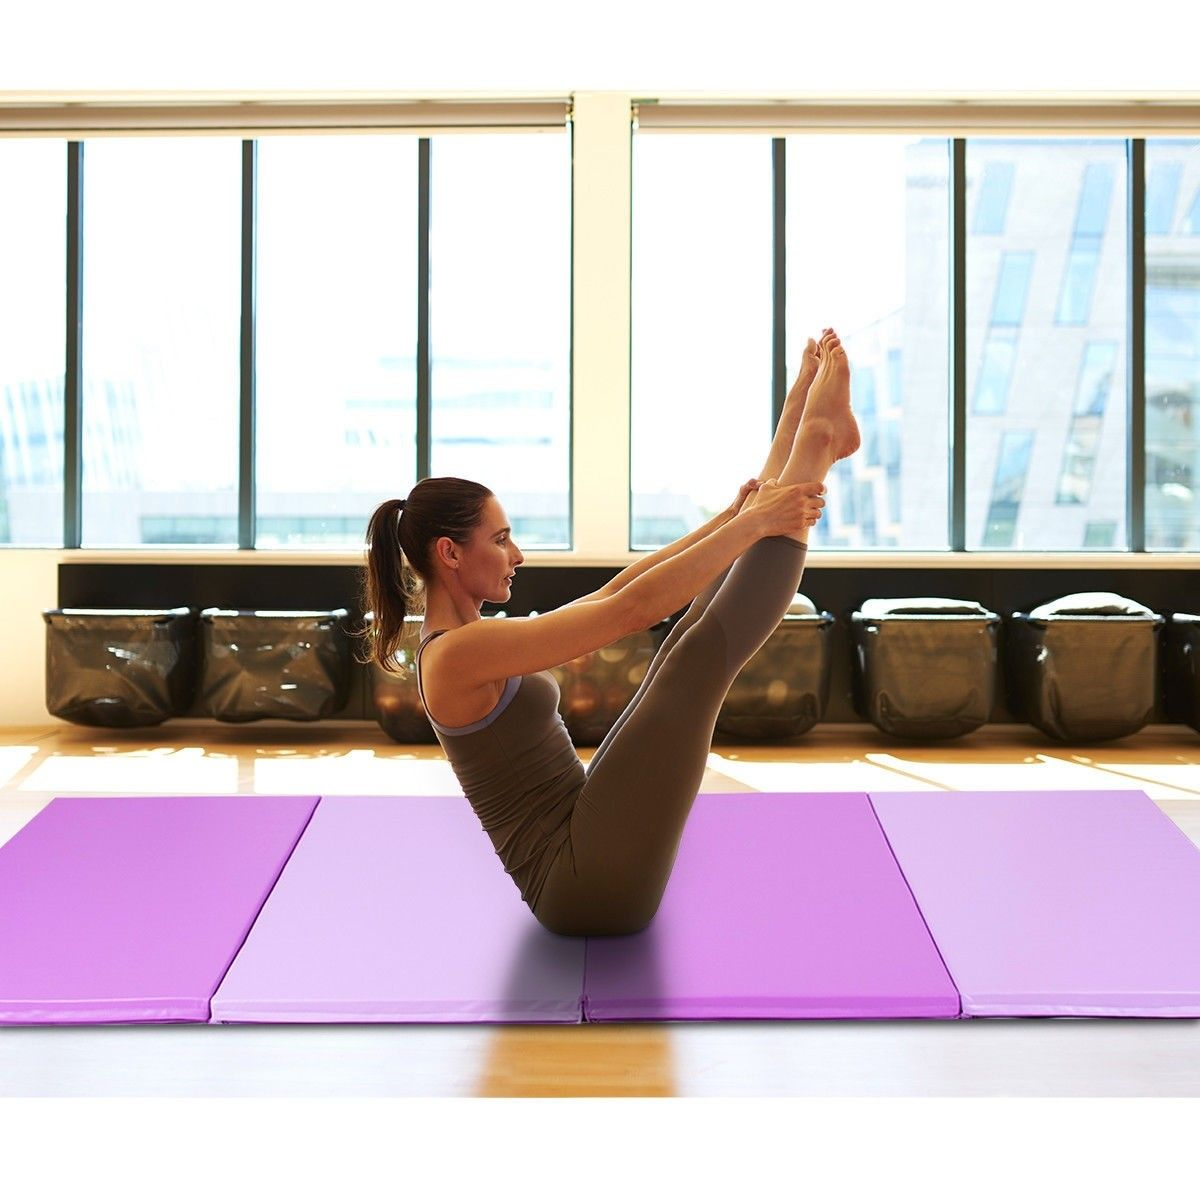 "4' x 10' x 2"" Thick Folding Gym Gymnastic Mat Gymnastics"